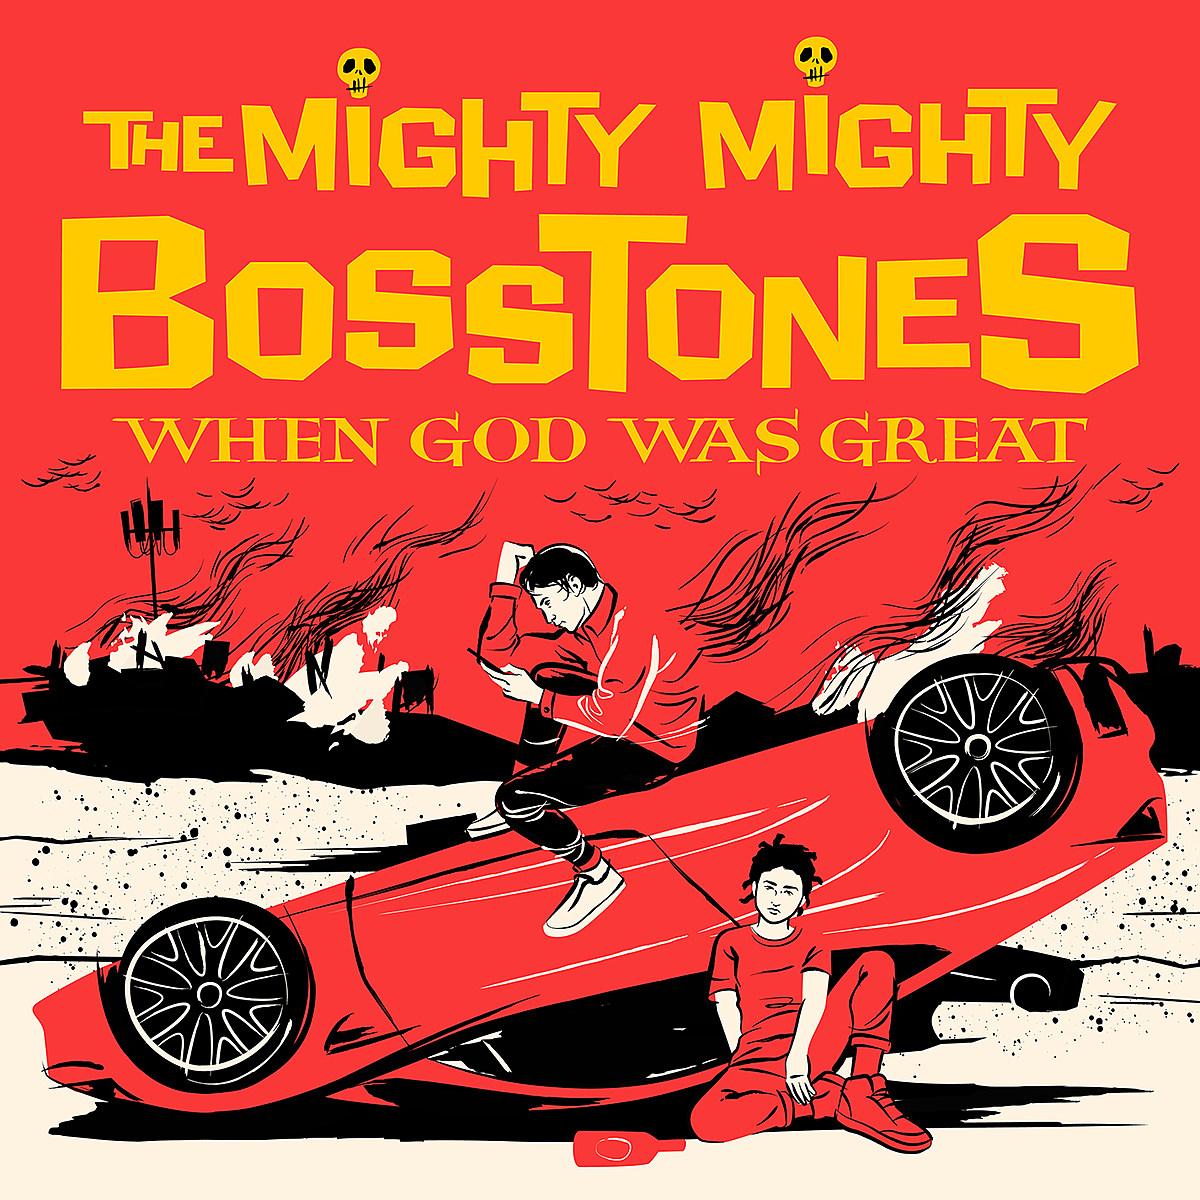 The Mighty Mighty Bosstones - Noise Brigade 7-23-2017